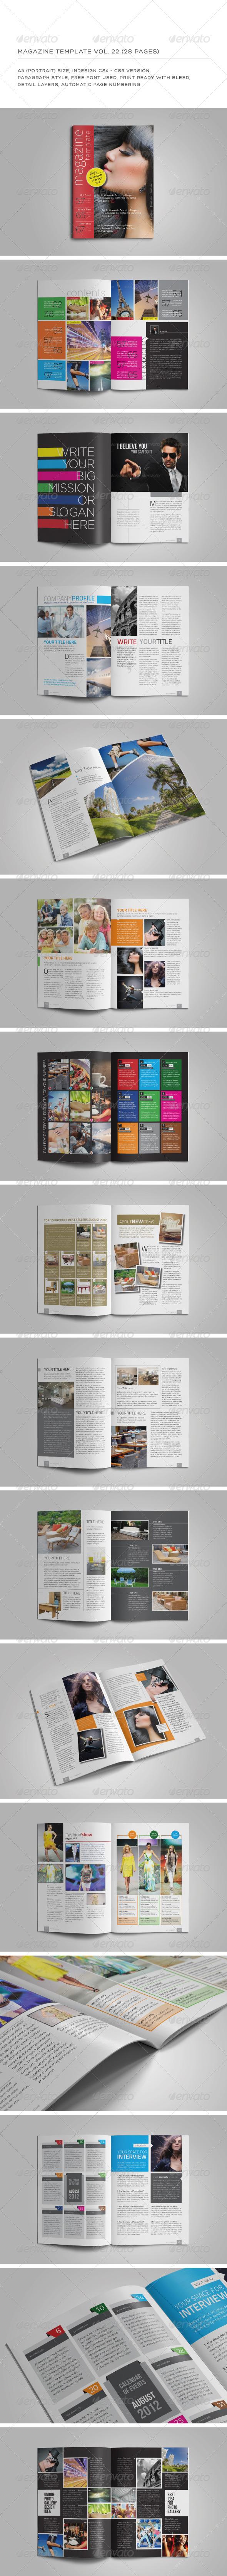 A5 Portrait 28 Pages MGZ (Vol. 22) - Magazines Print Templates